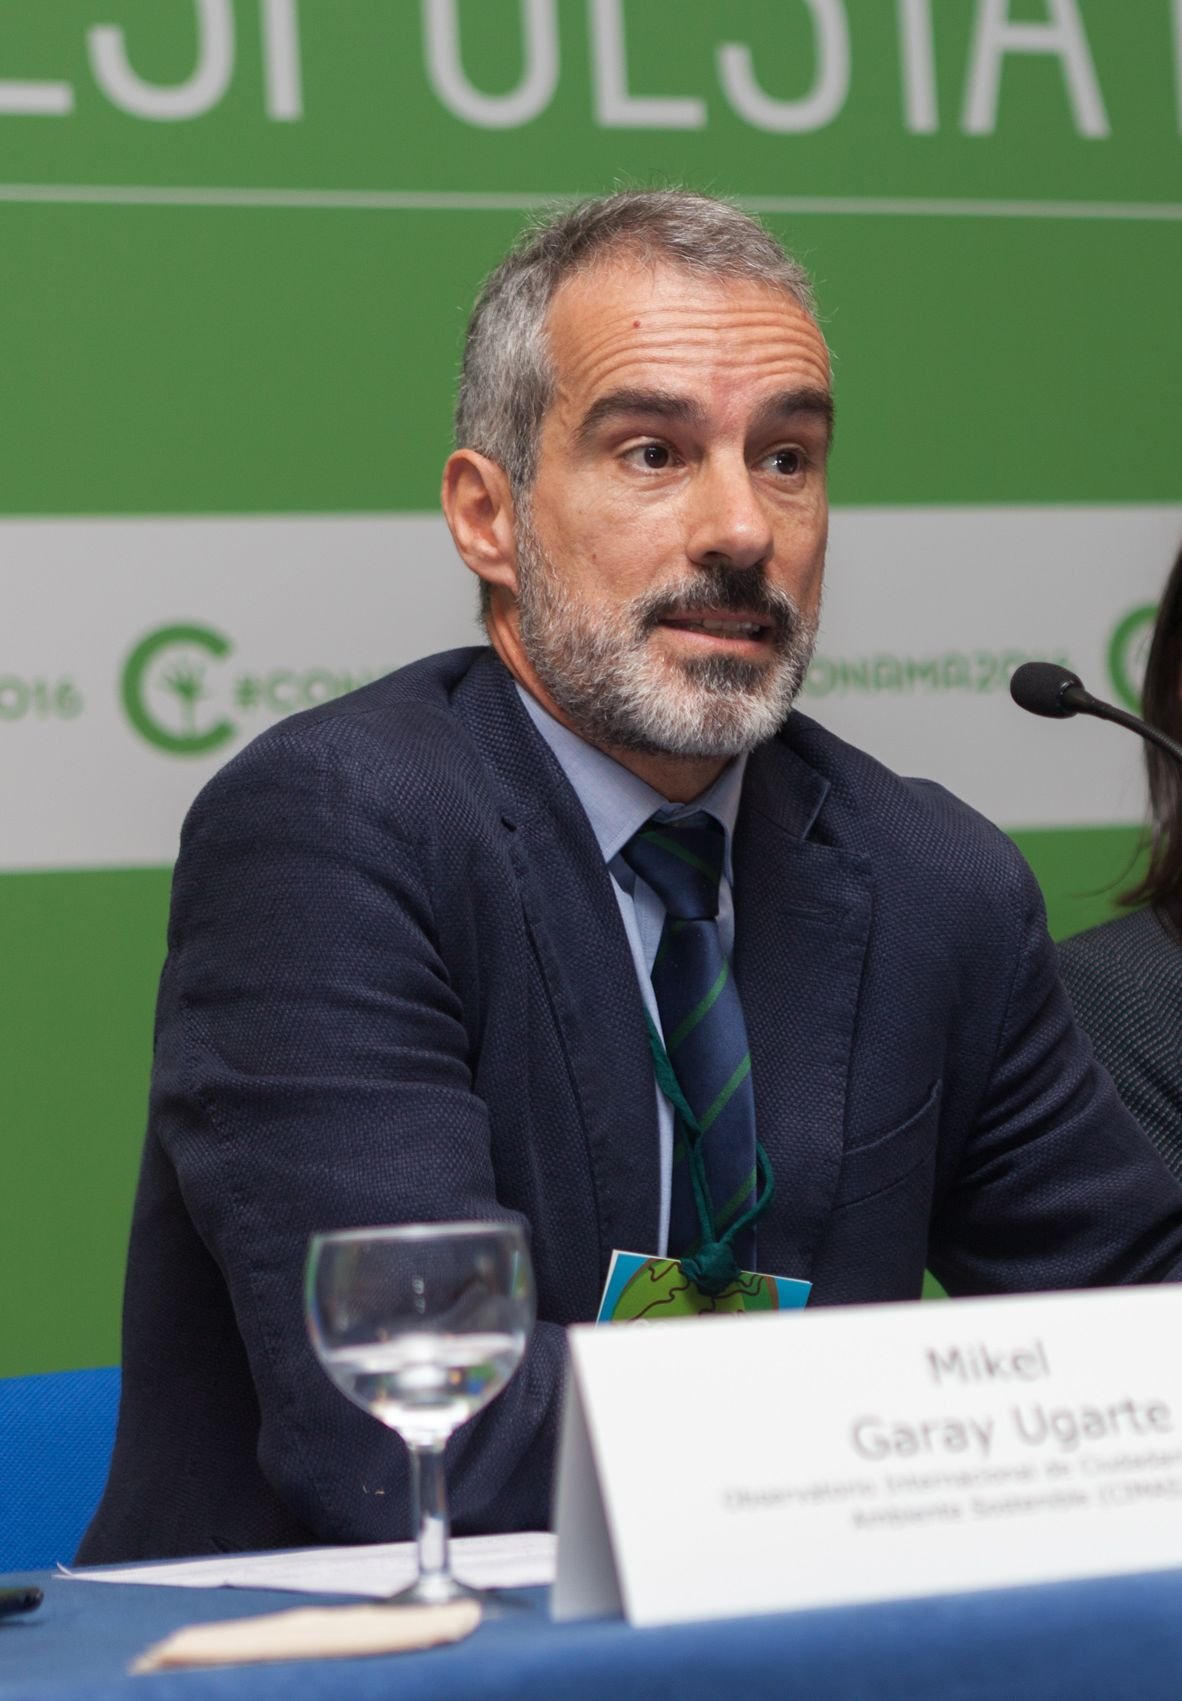 Mikel Garay Ugarte